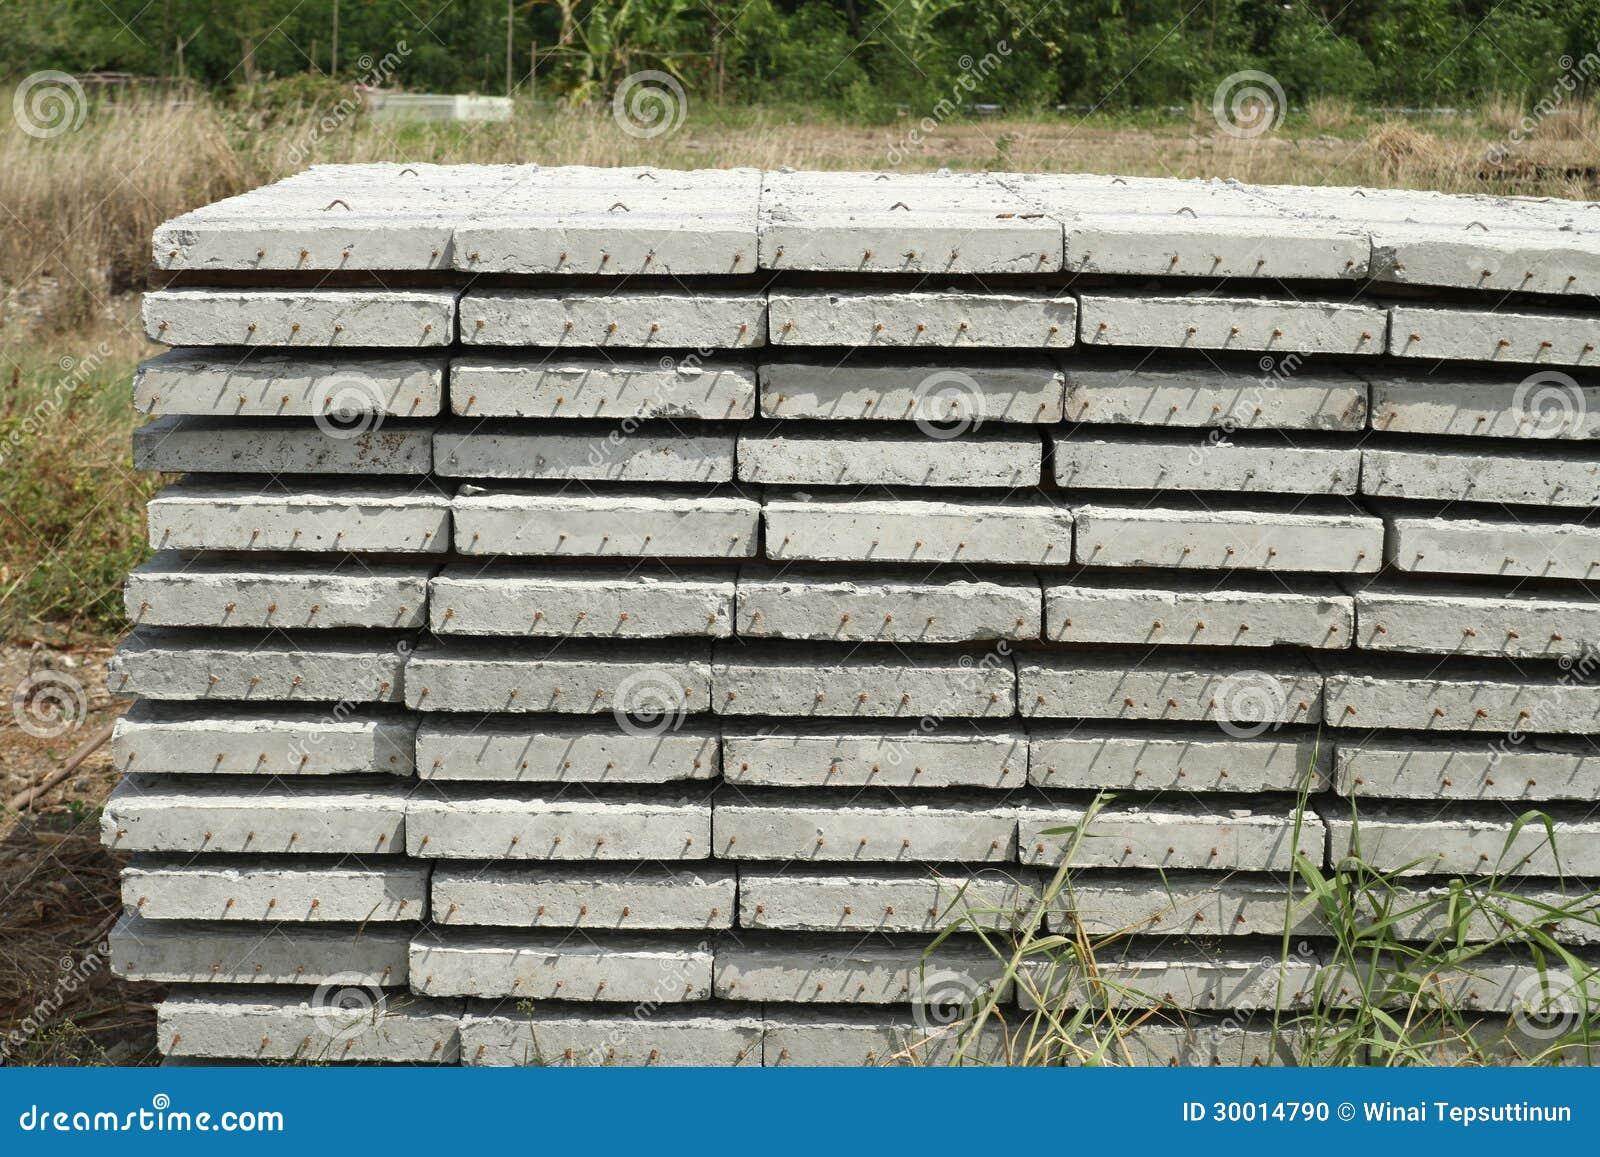 Concrete Building Slab Stock Photo Image 30014790